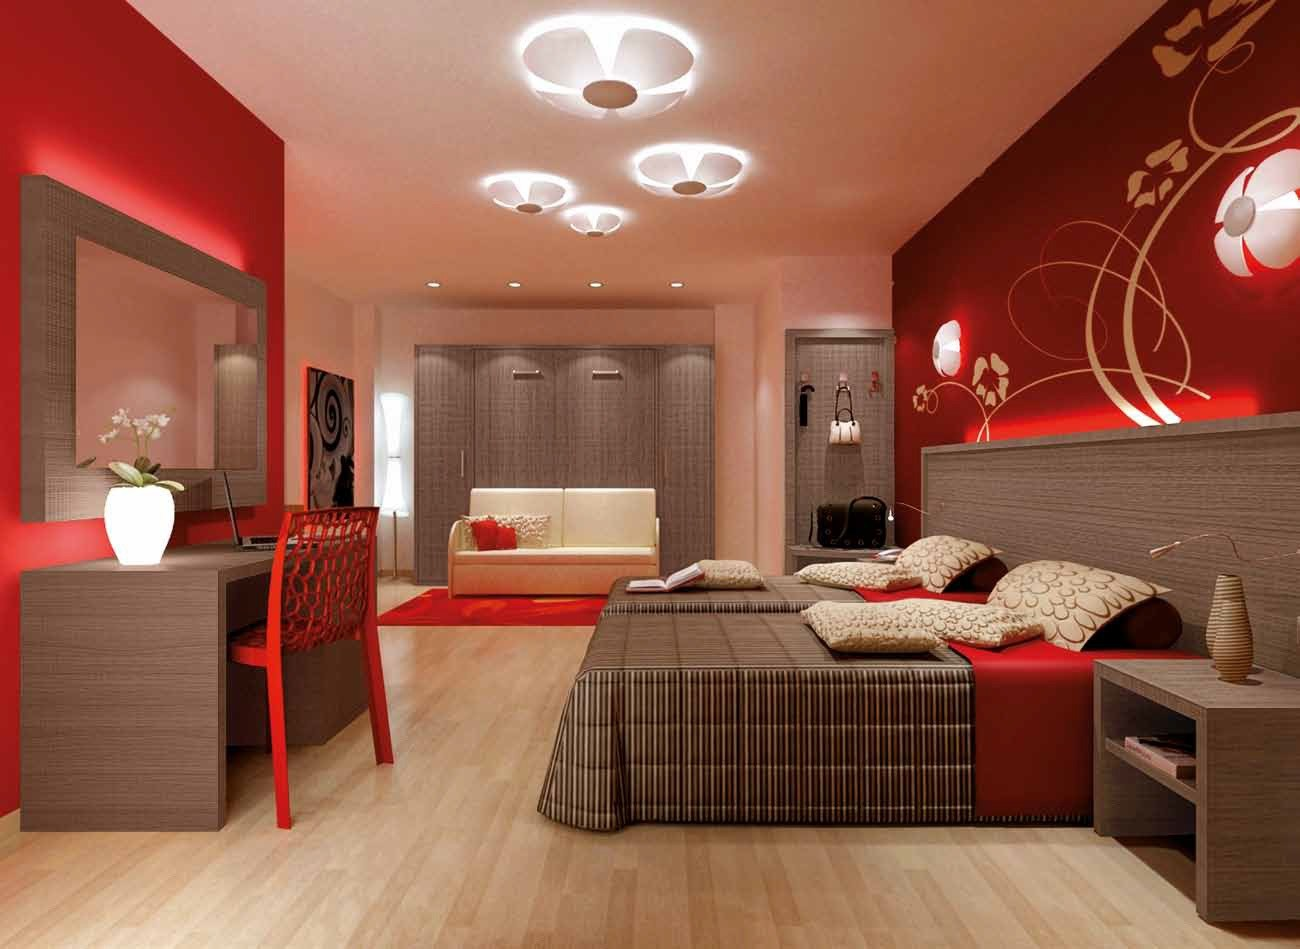 Arredamento per residence in stile moderno zeus by for Consolle arredamento moderno